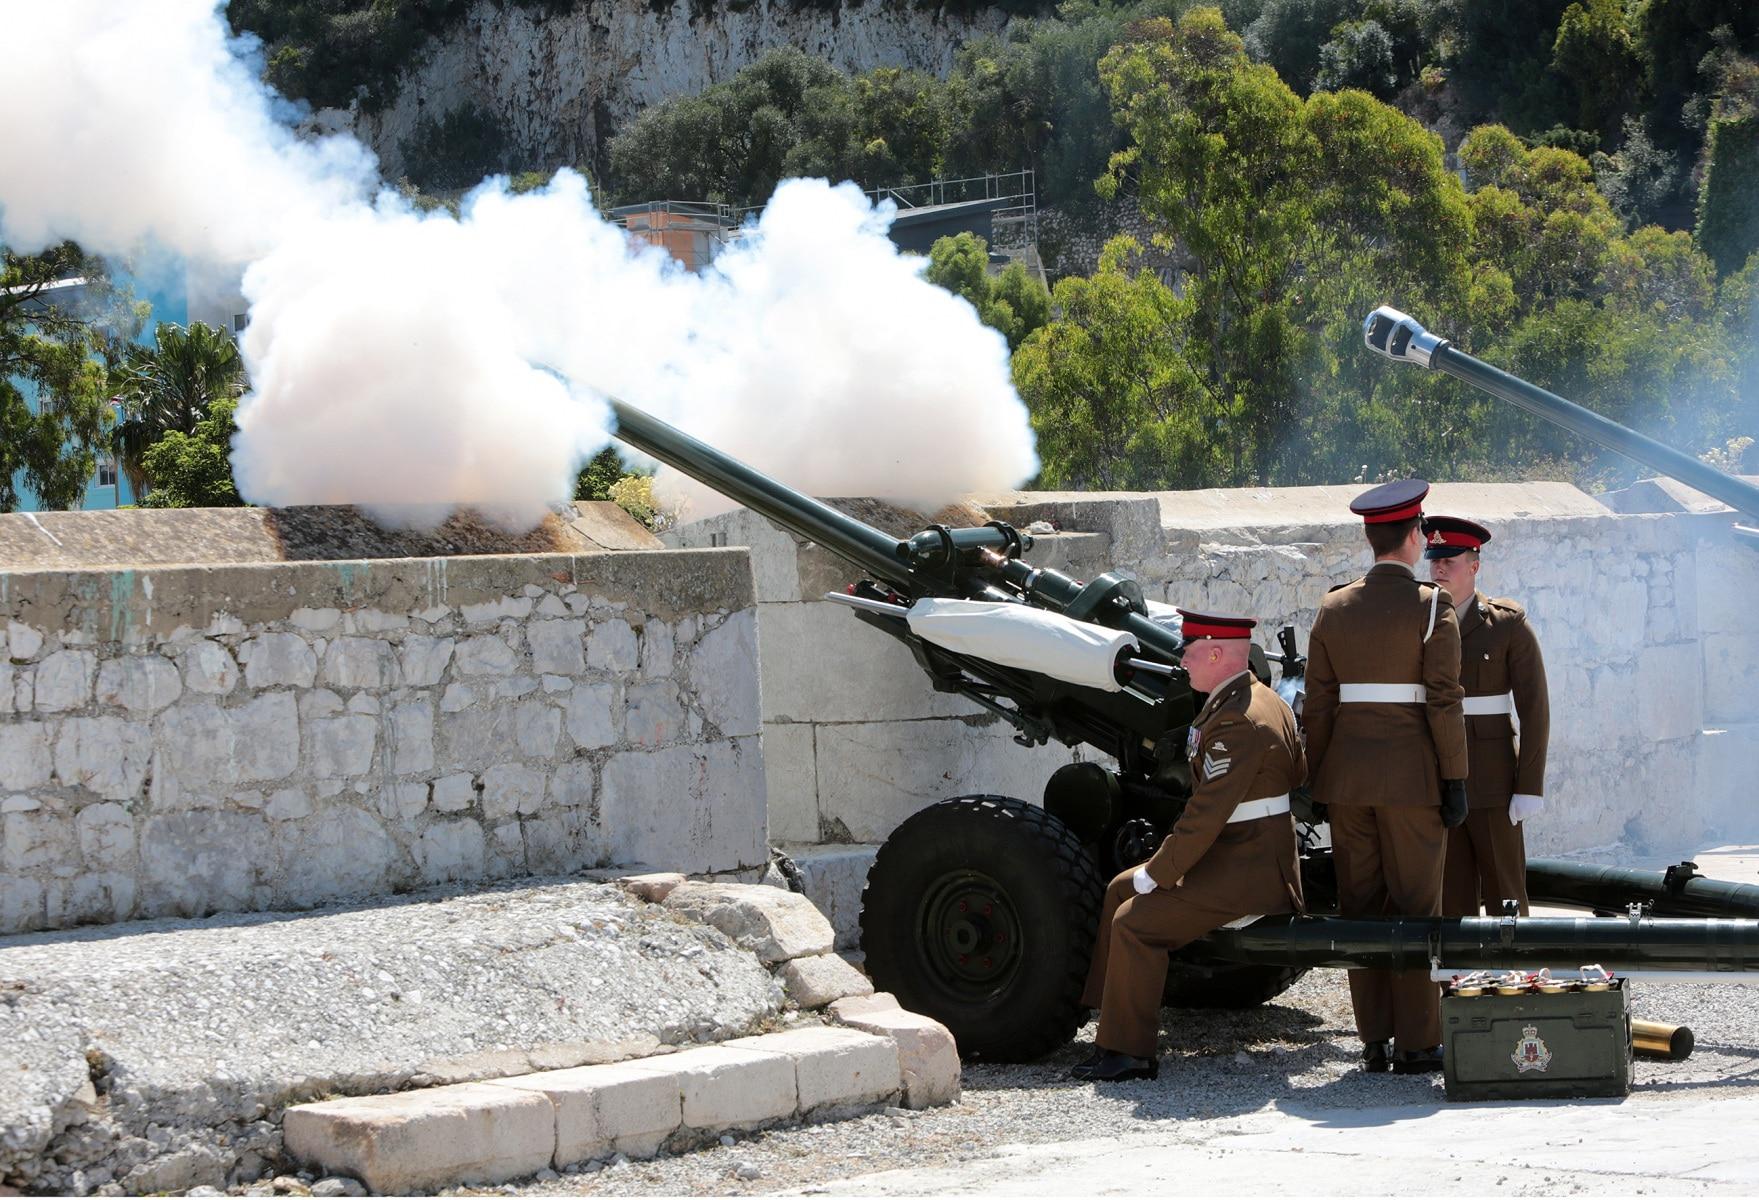 2-jun-2016-salvas-en-gibraltar-honor-al-aniversario-de-coronacin-de-la-reina_27417180775_o